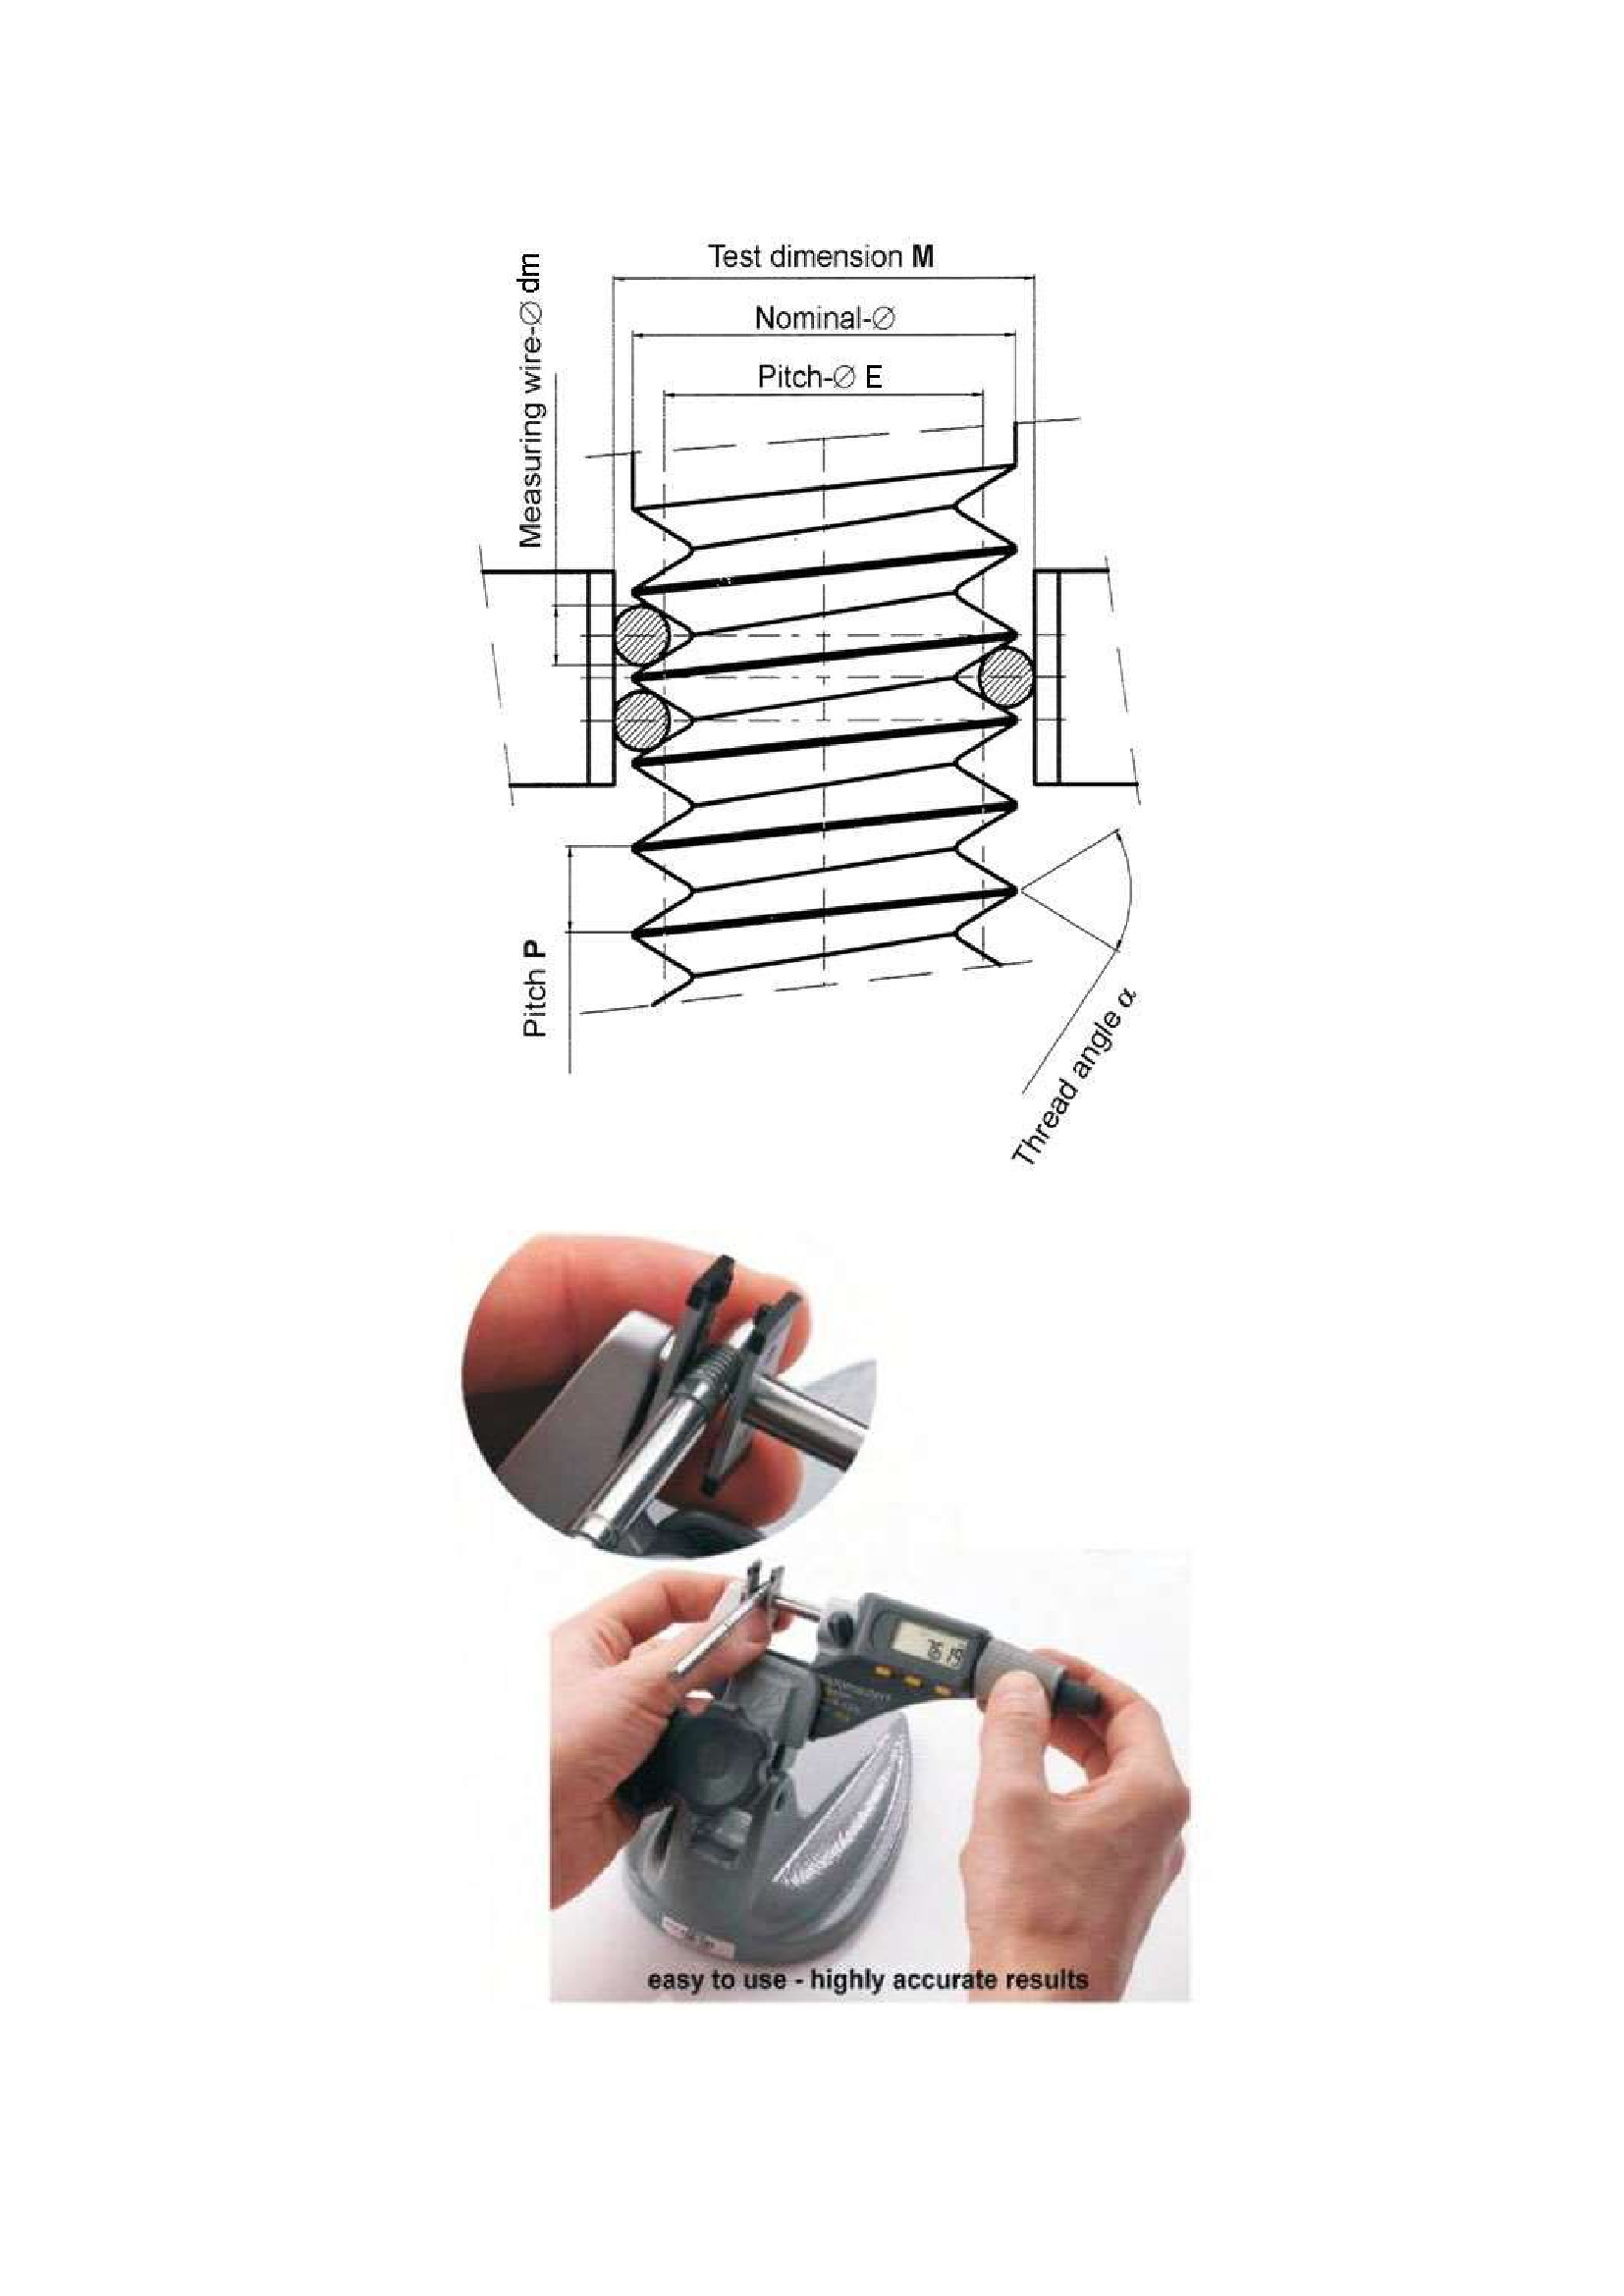 proimages/QC/7._Thread_measuring_wires-4.jpg